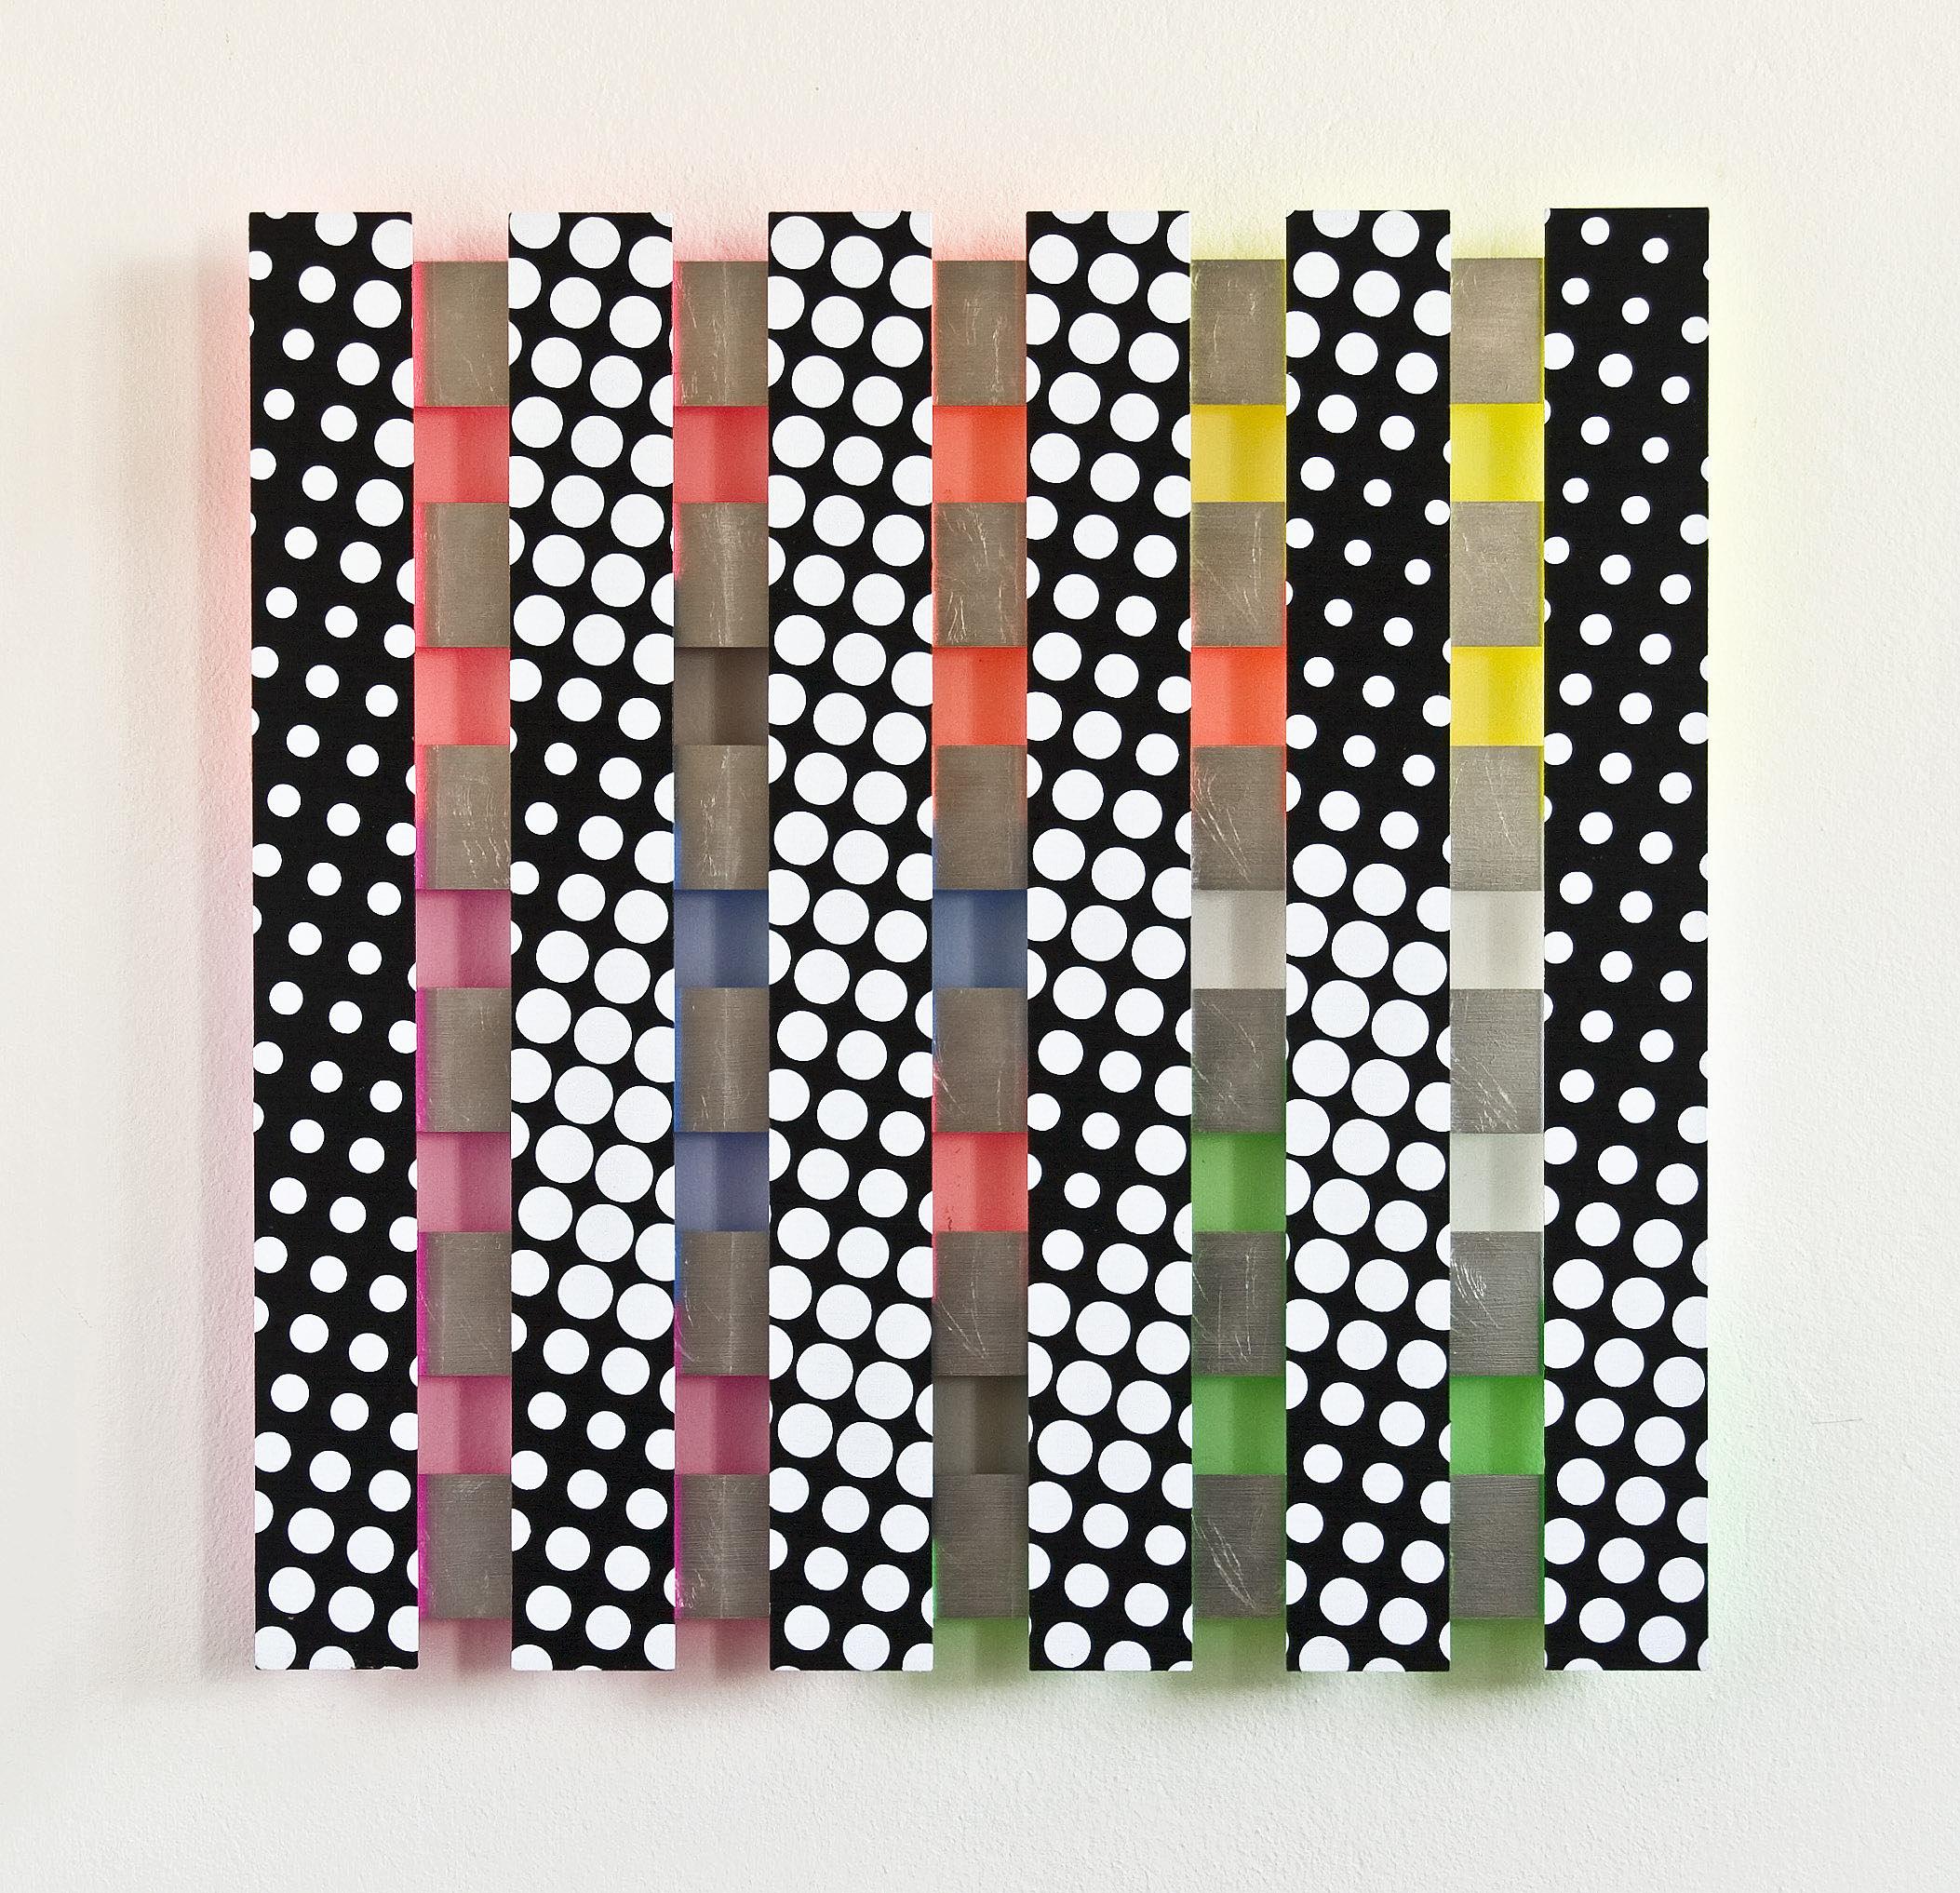 2u akril, les, 79 x 79 cm, 2010.jpg